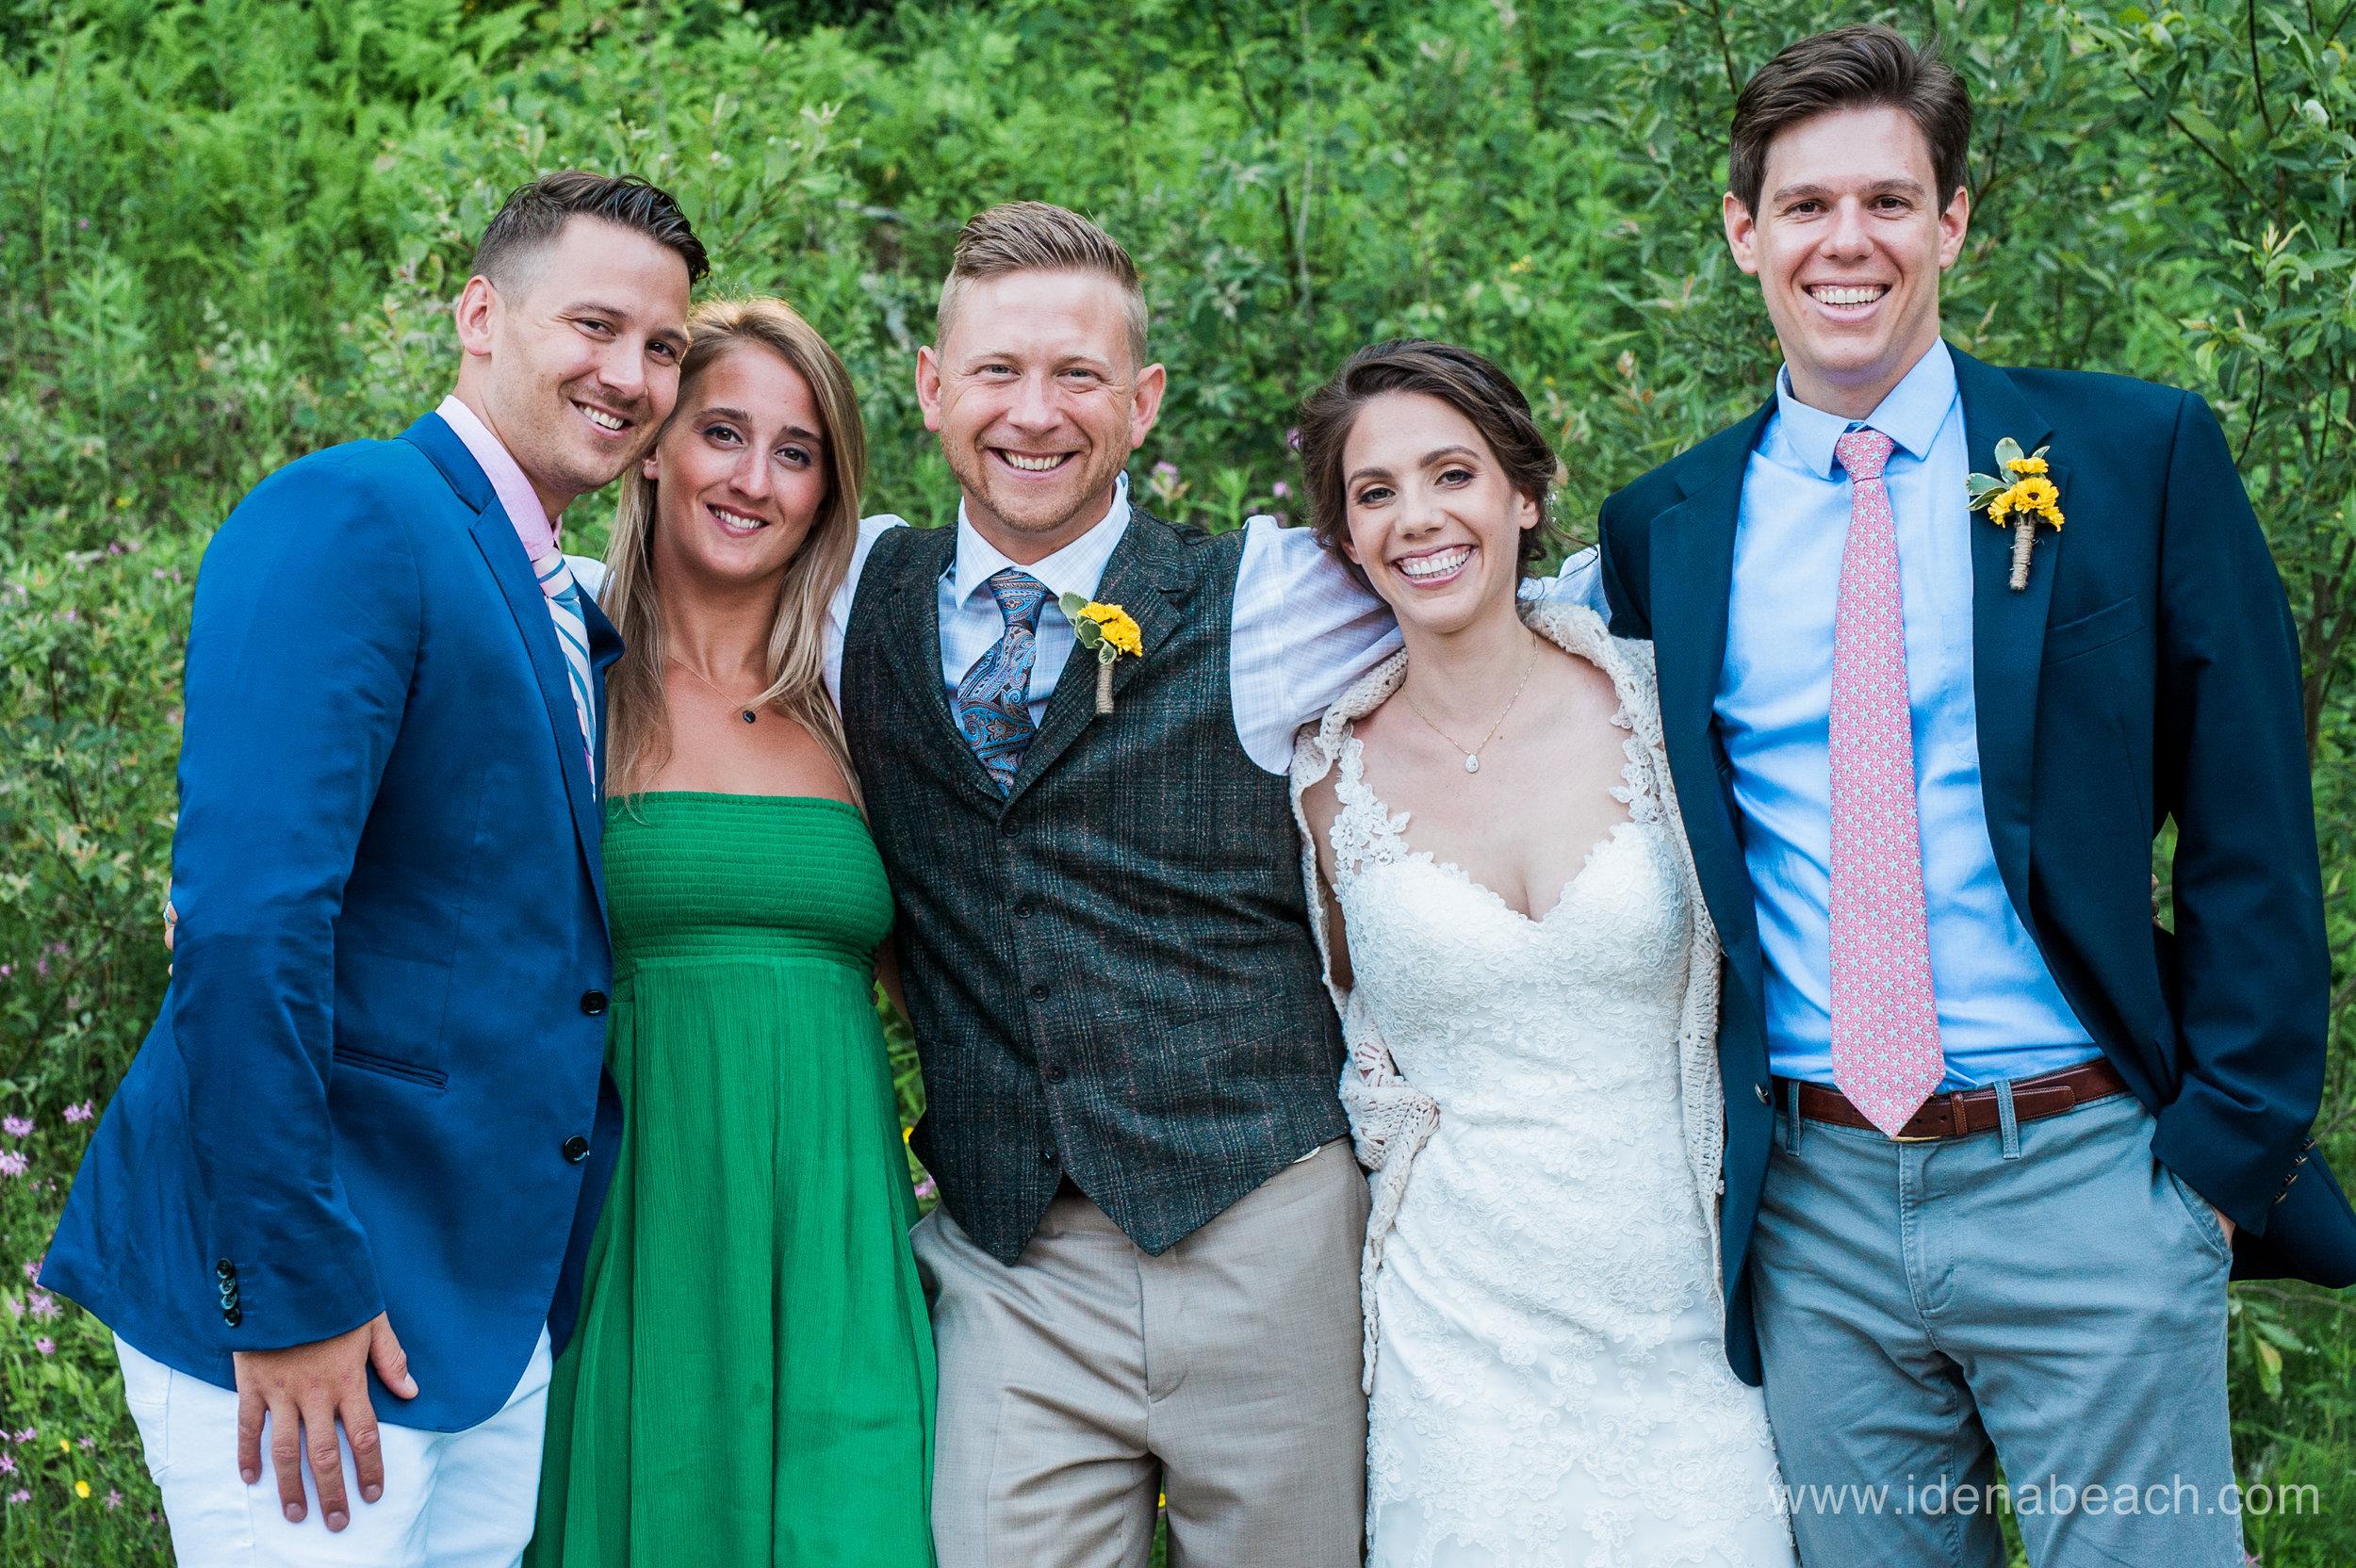 IdenaBeach-Vermont-Wedding-Photographer-Mountain-Top-Inn-97.jpg